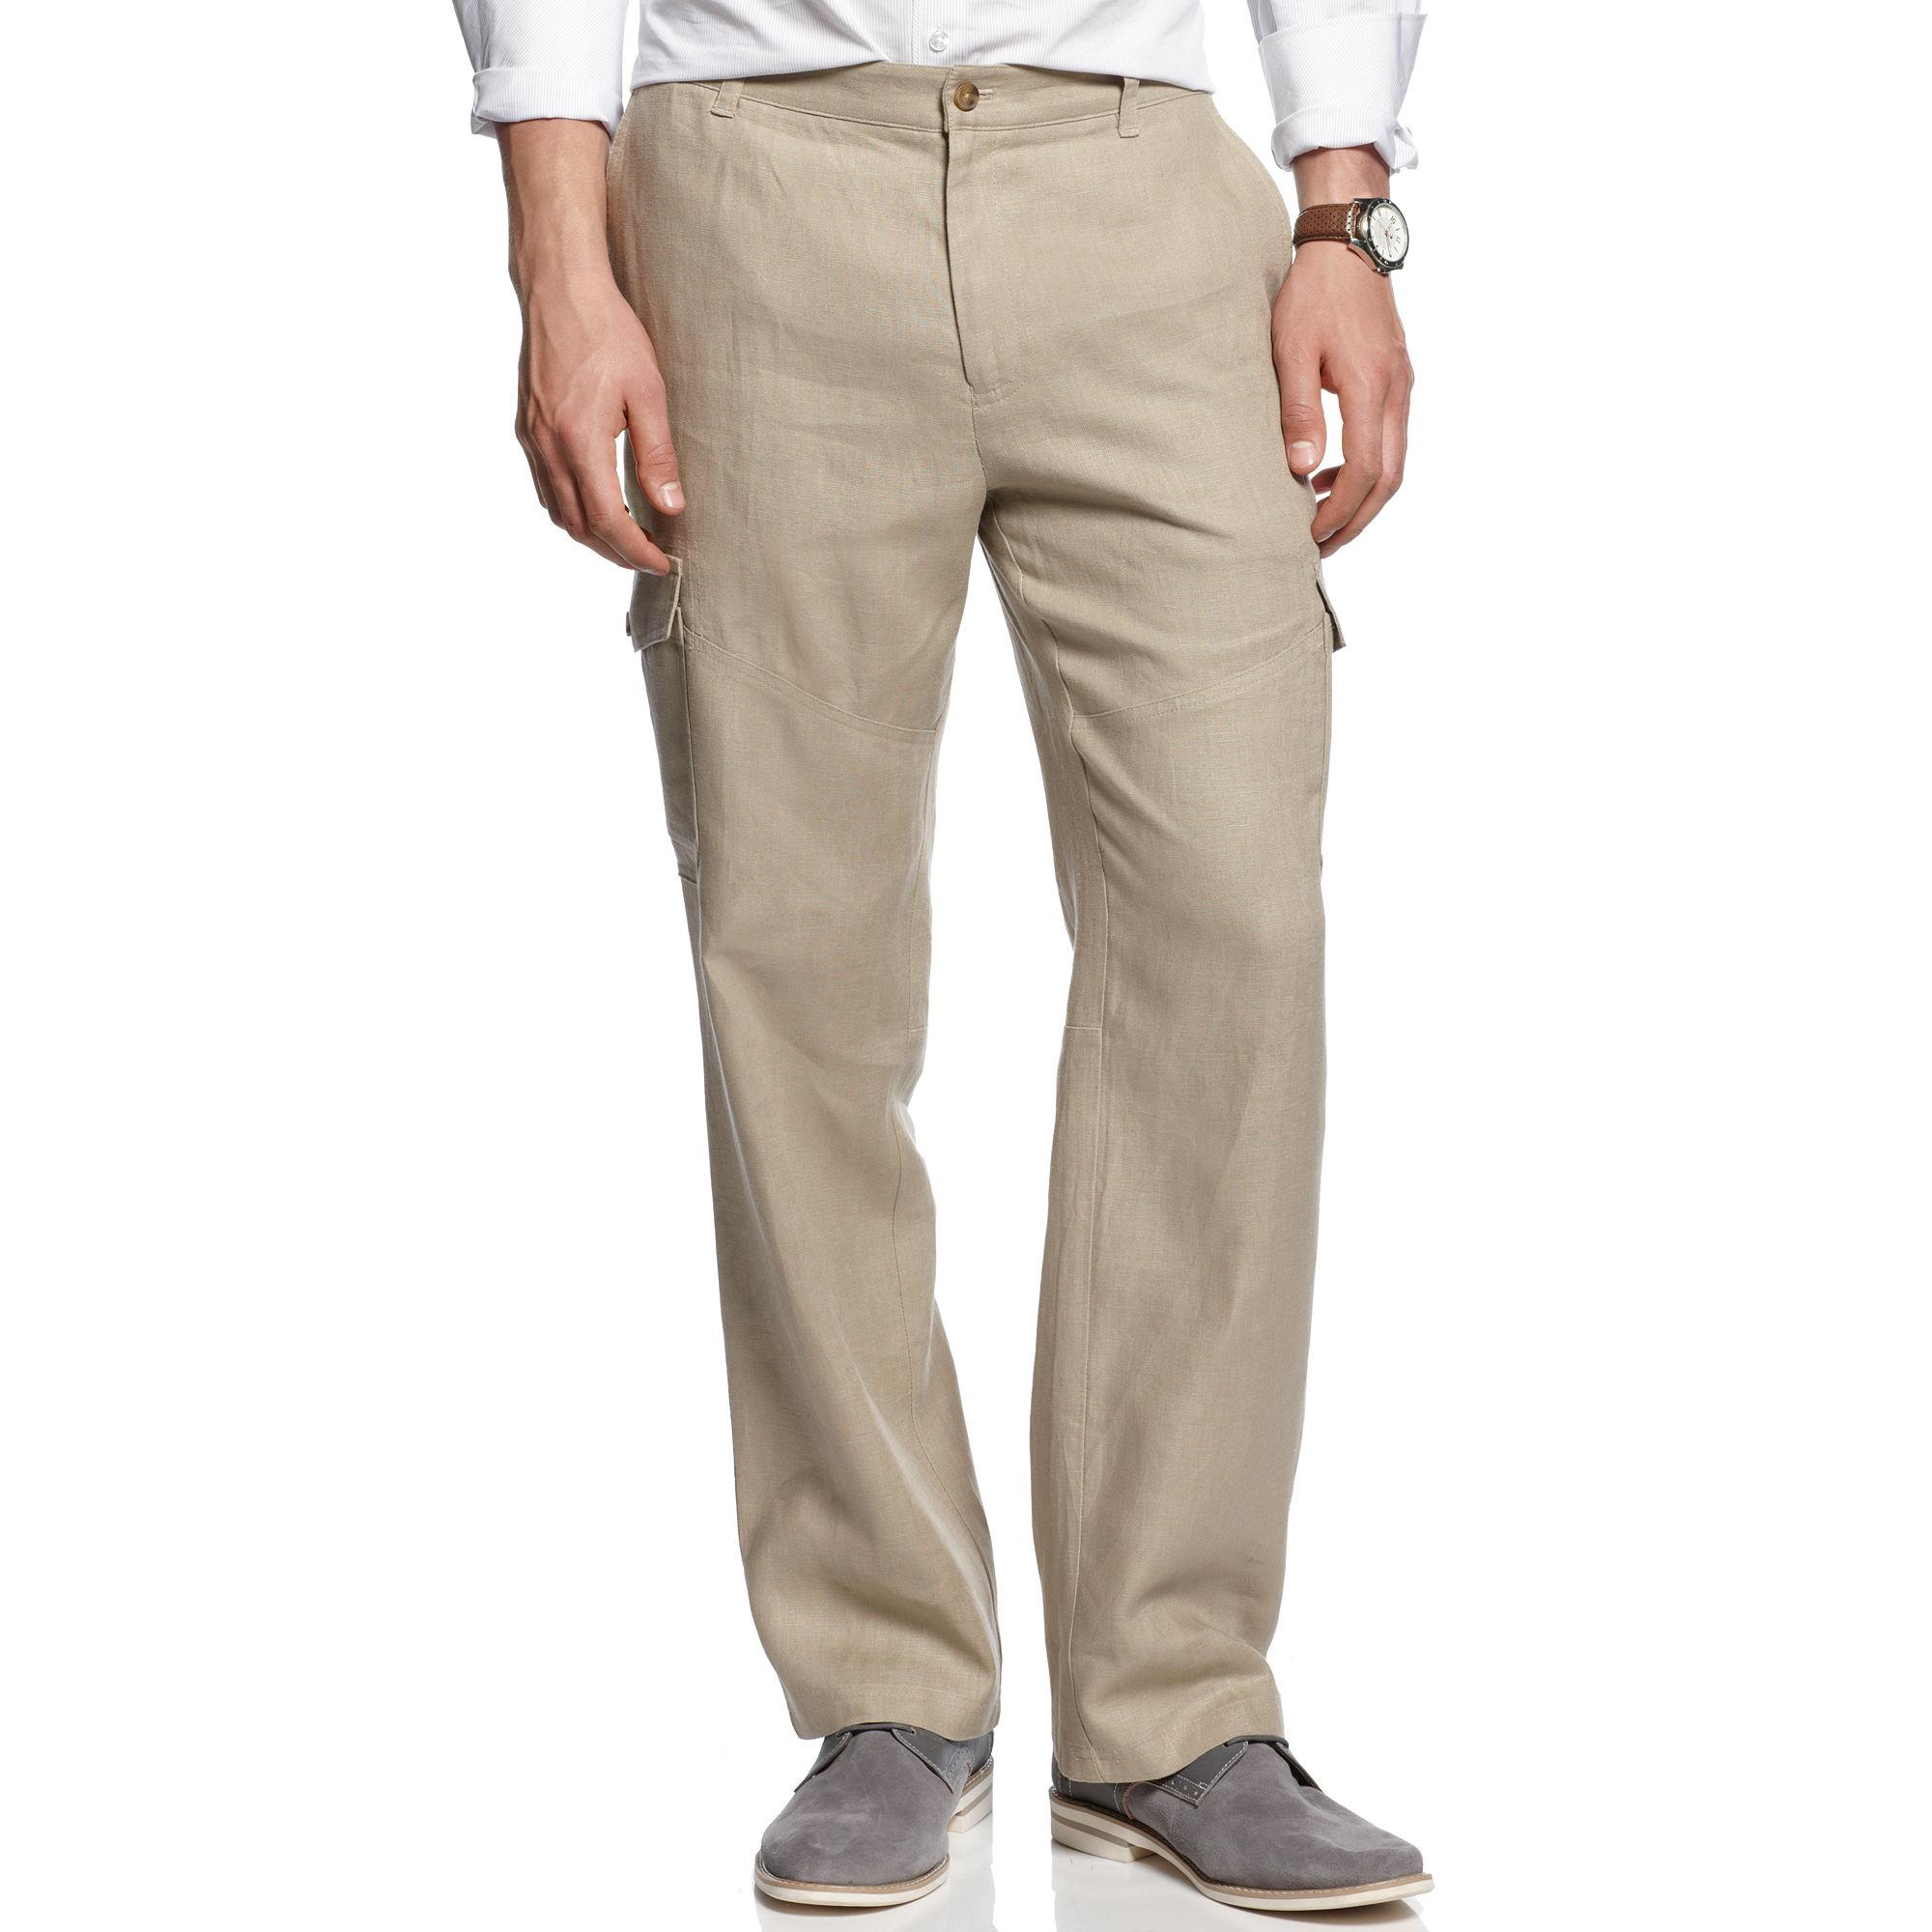 Inc International Concepts Linen Cargo Pants In Beige For